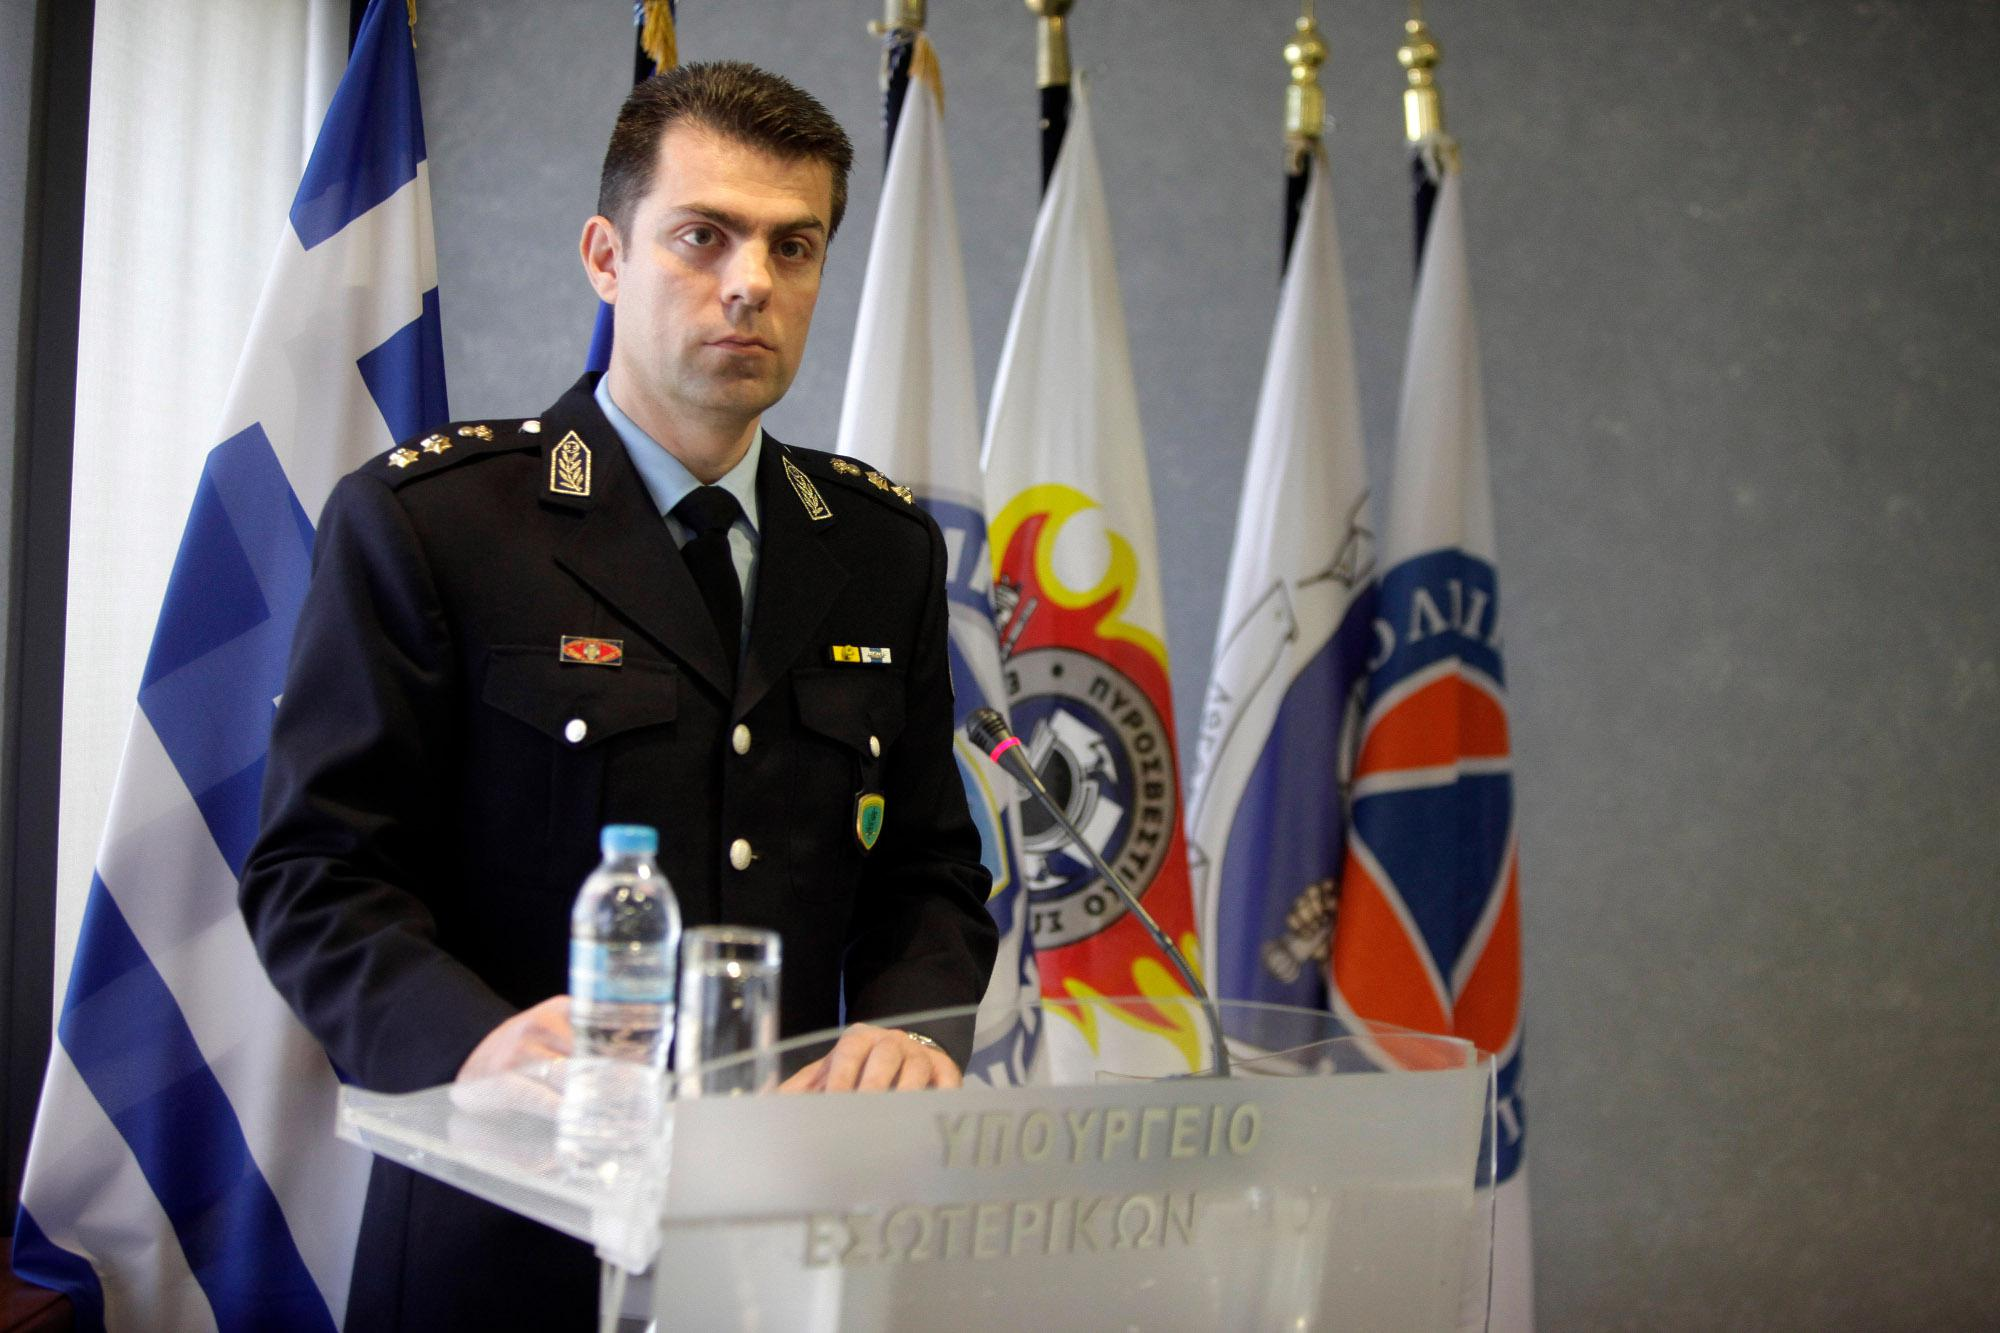 ekprospos-elas-gia-sulipsi-pola-roupa-1300 Η ανακοίνωση της ΕΛ.ΑΣ. για την σύλληψη της Πόλας Ρούπα